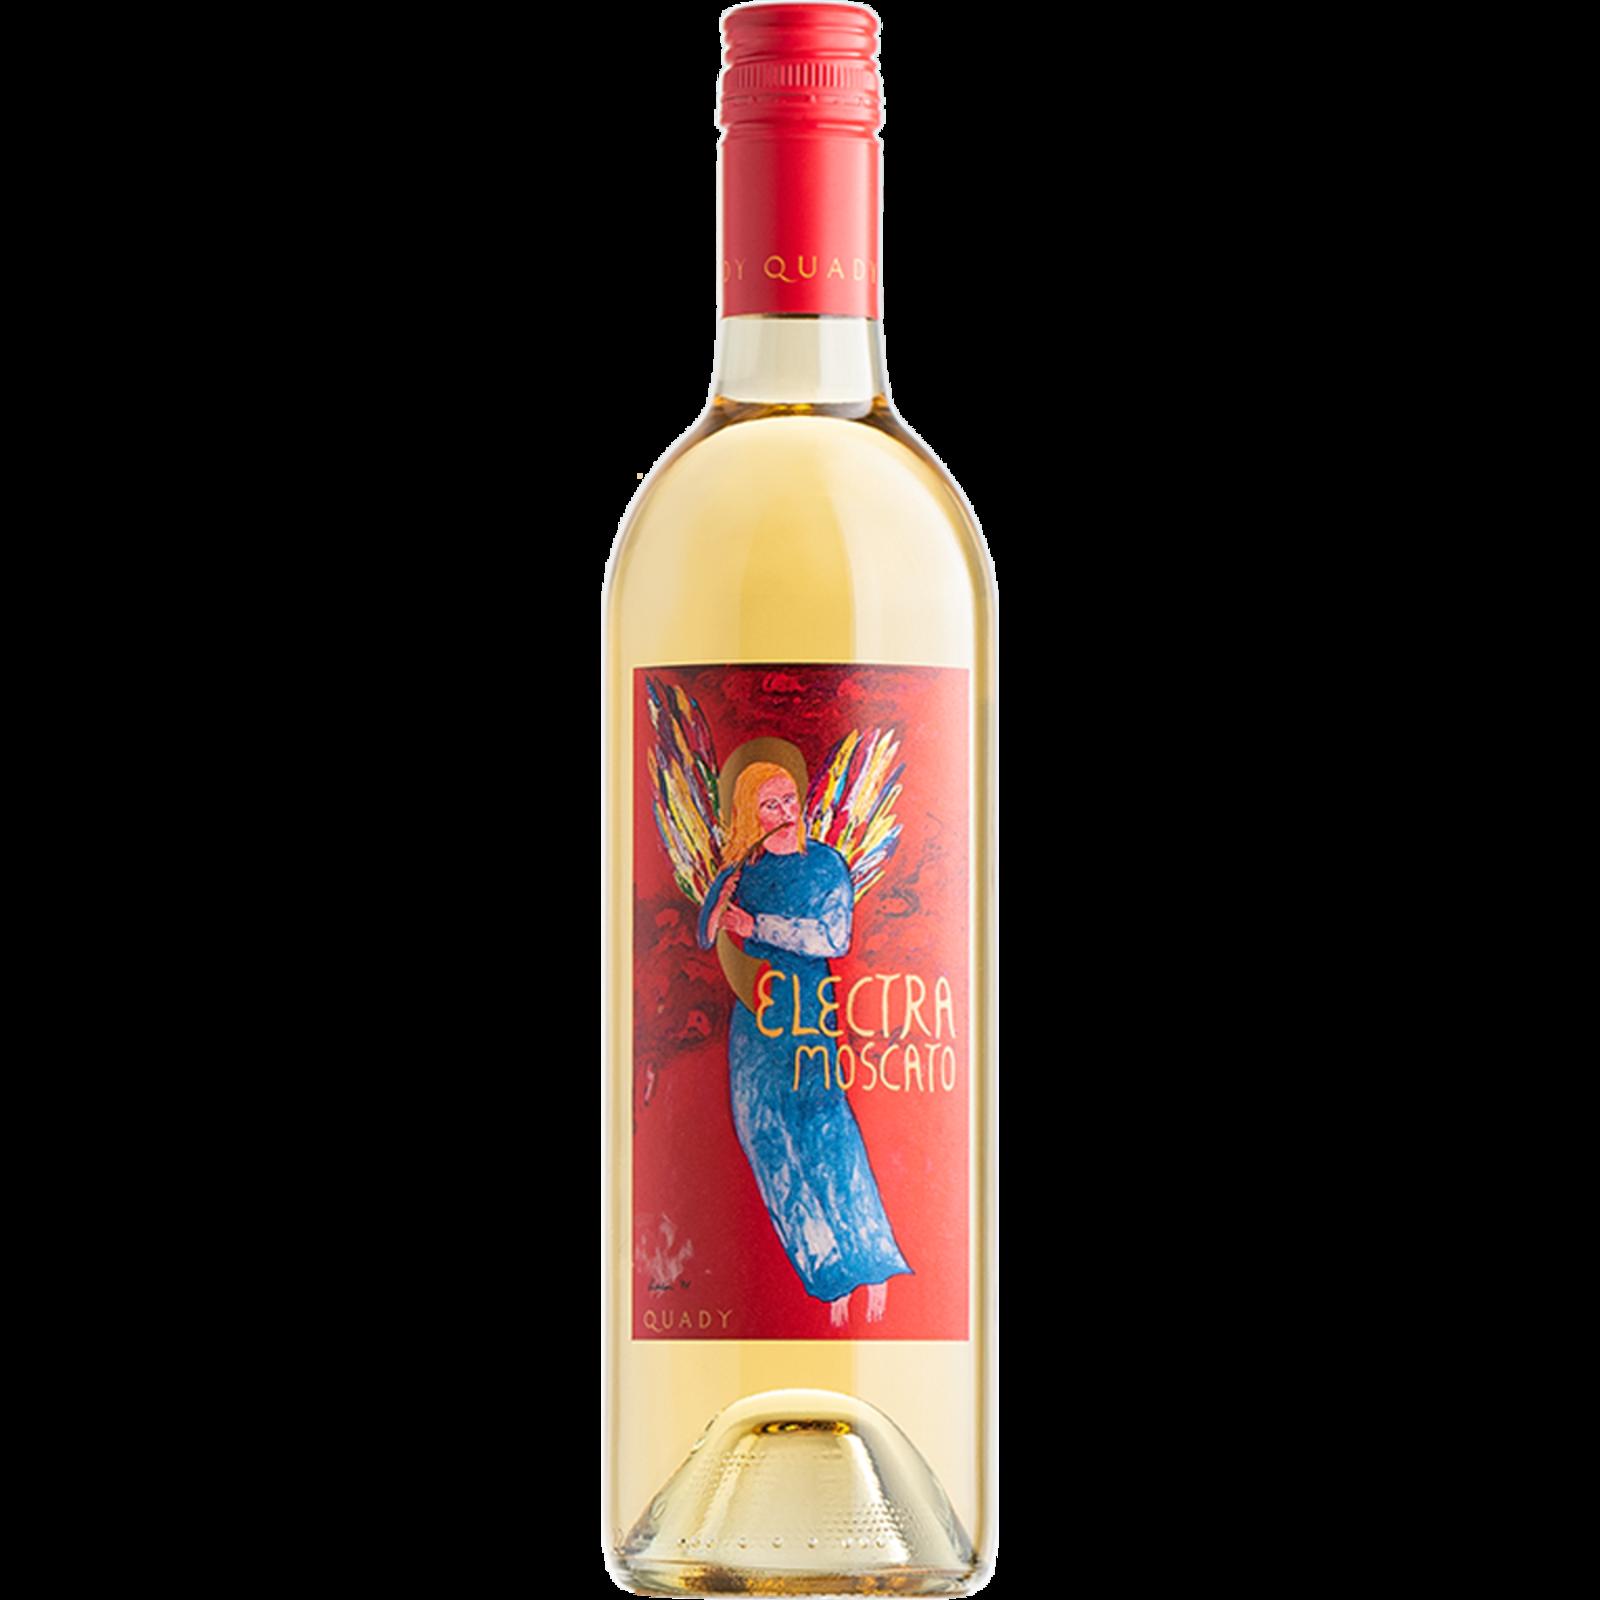 Quady Winery Quady Winery Electra Moscato 2018